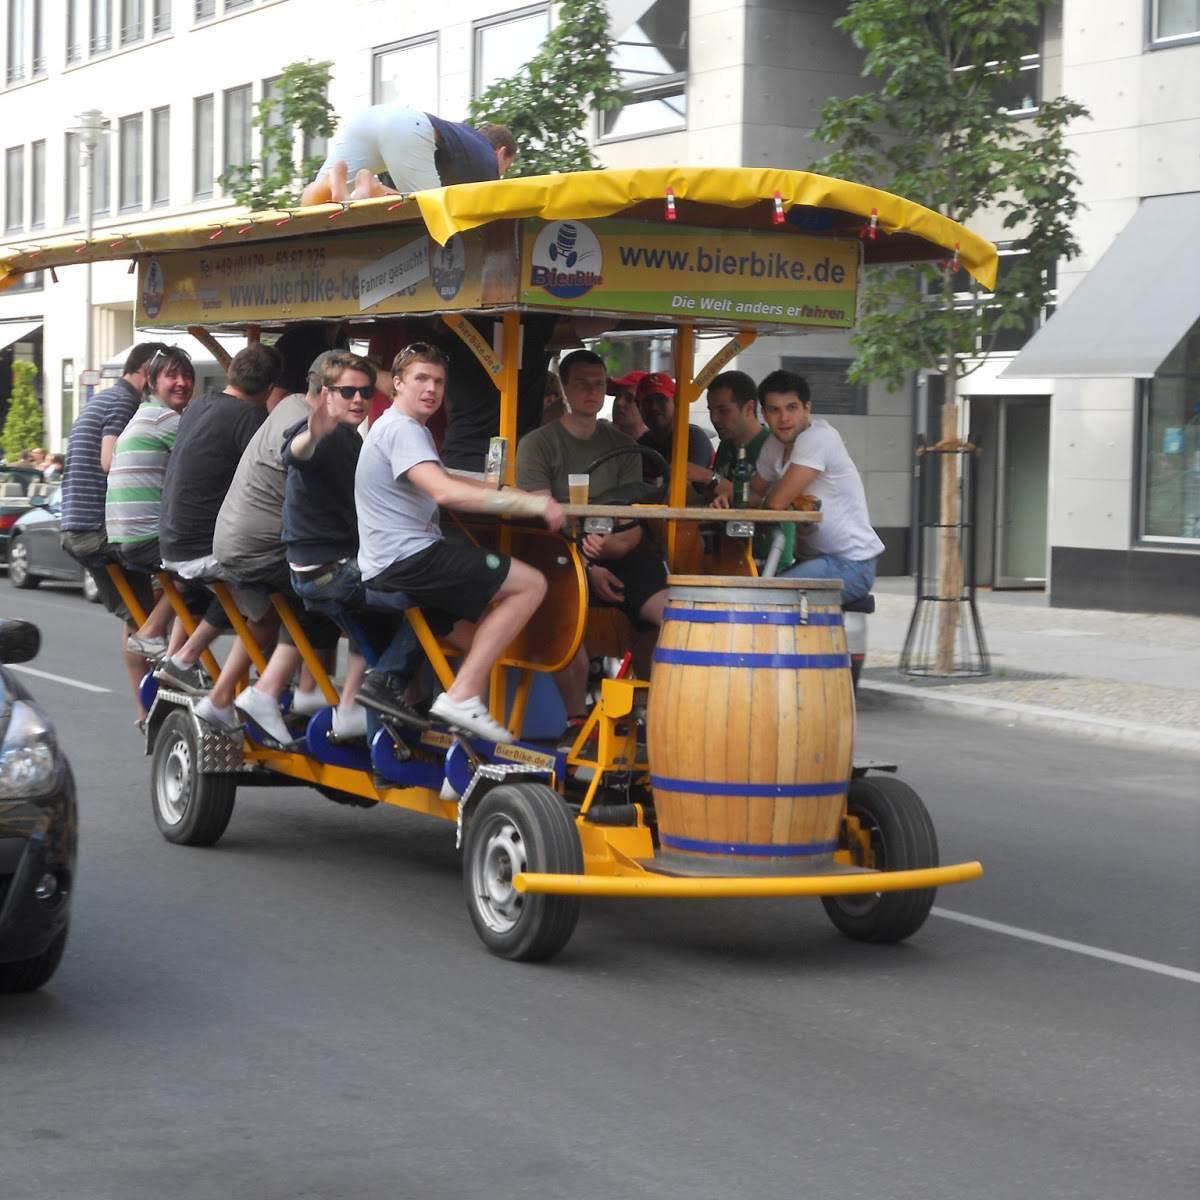 maennertag beer bike.JPG